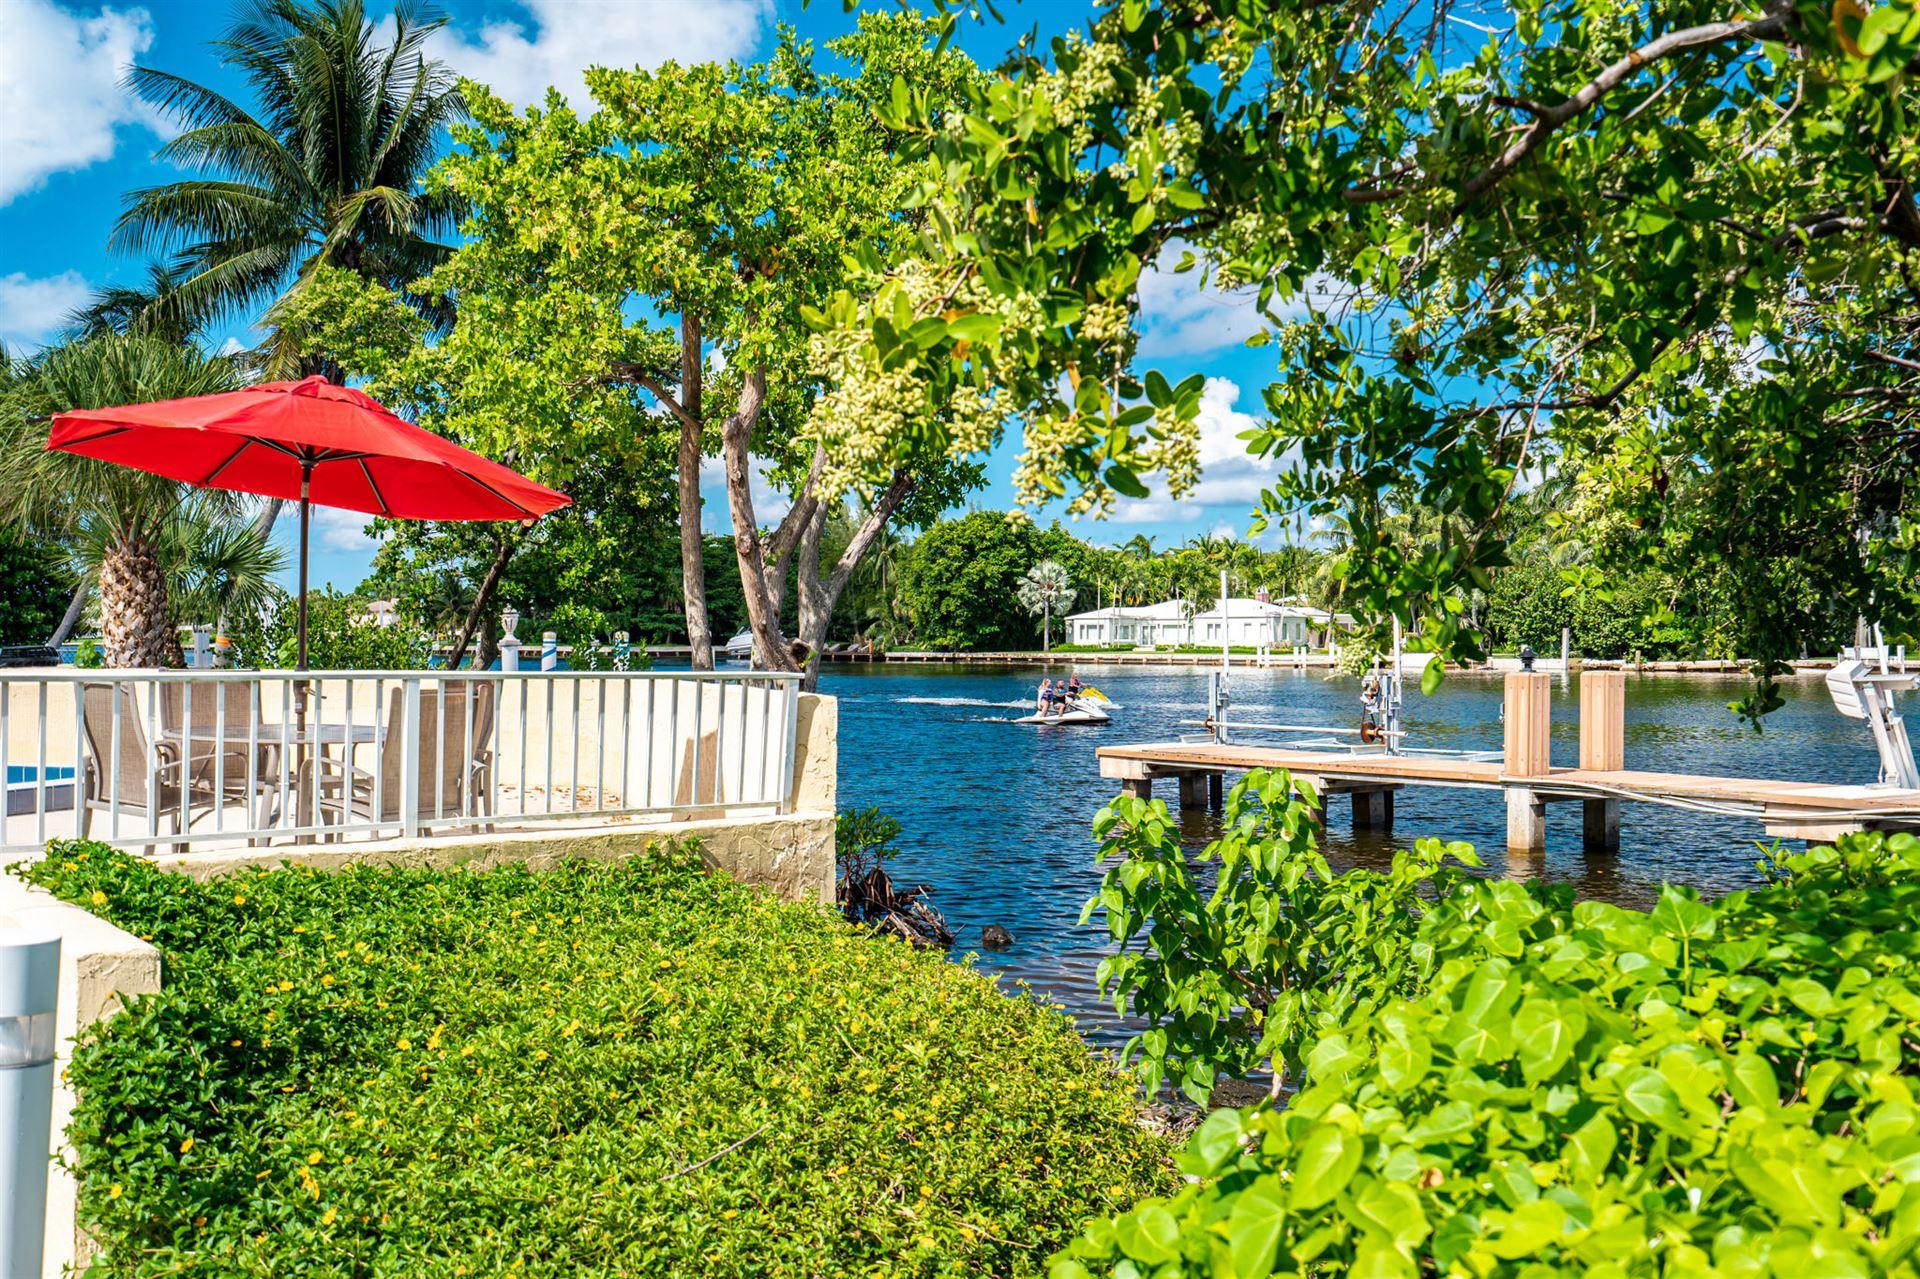 931 Palm Trail #9, Delray Beach, FL 33483 - MLS#: RX-10701924